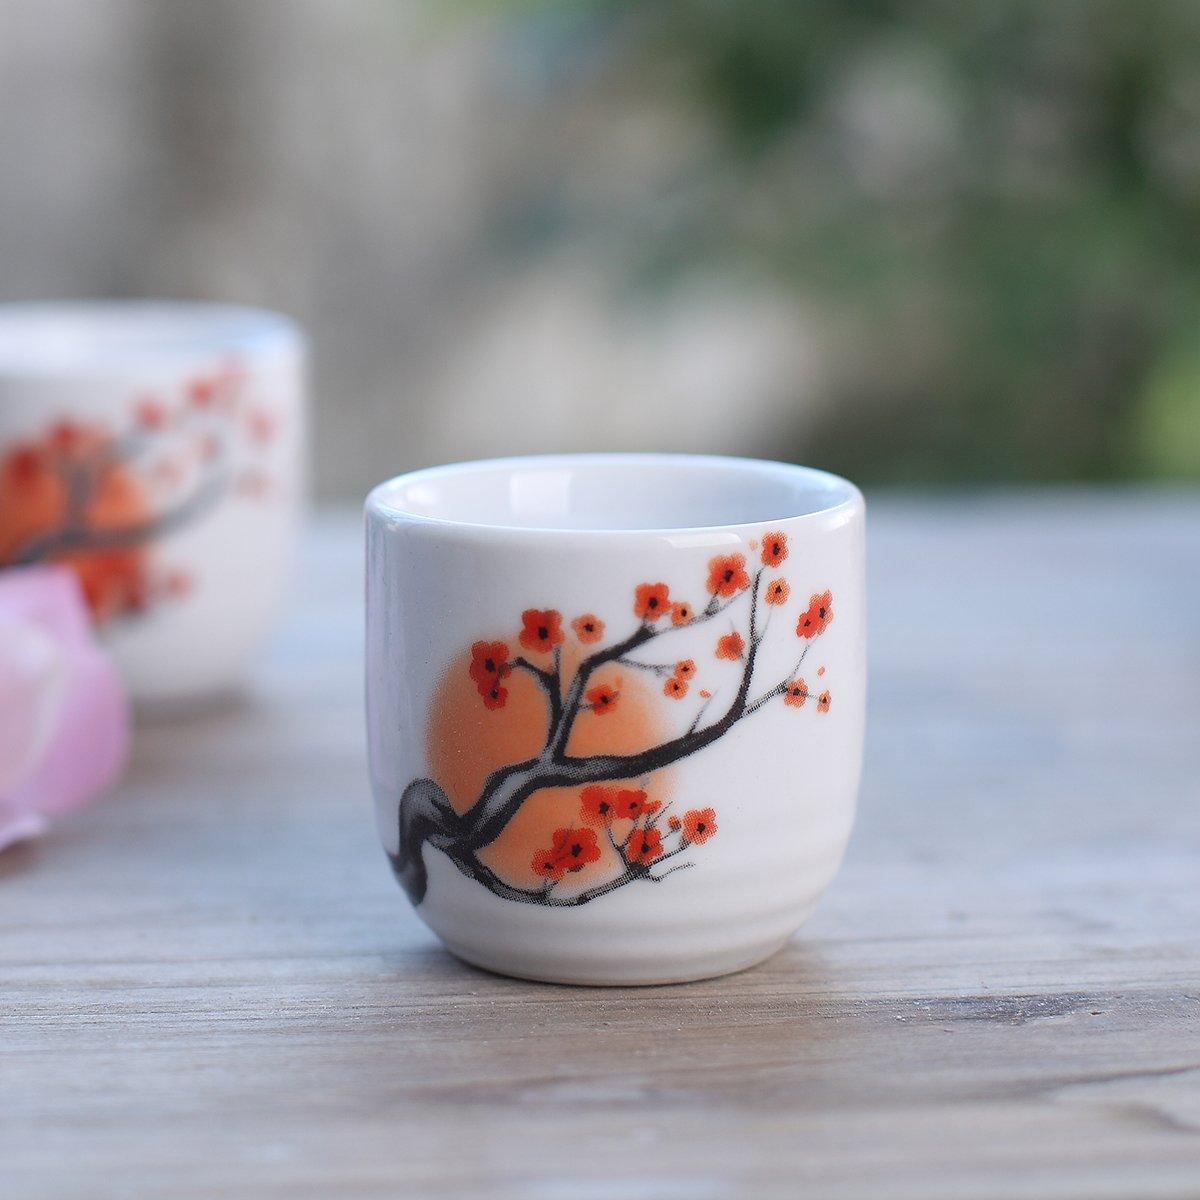 Tosnail 5 pcs Ceramic Japanese Sake Set - Orange Blossom by Tosnail (Image #3)